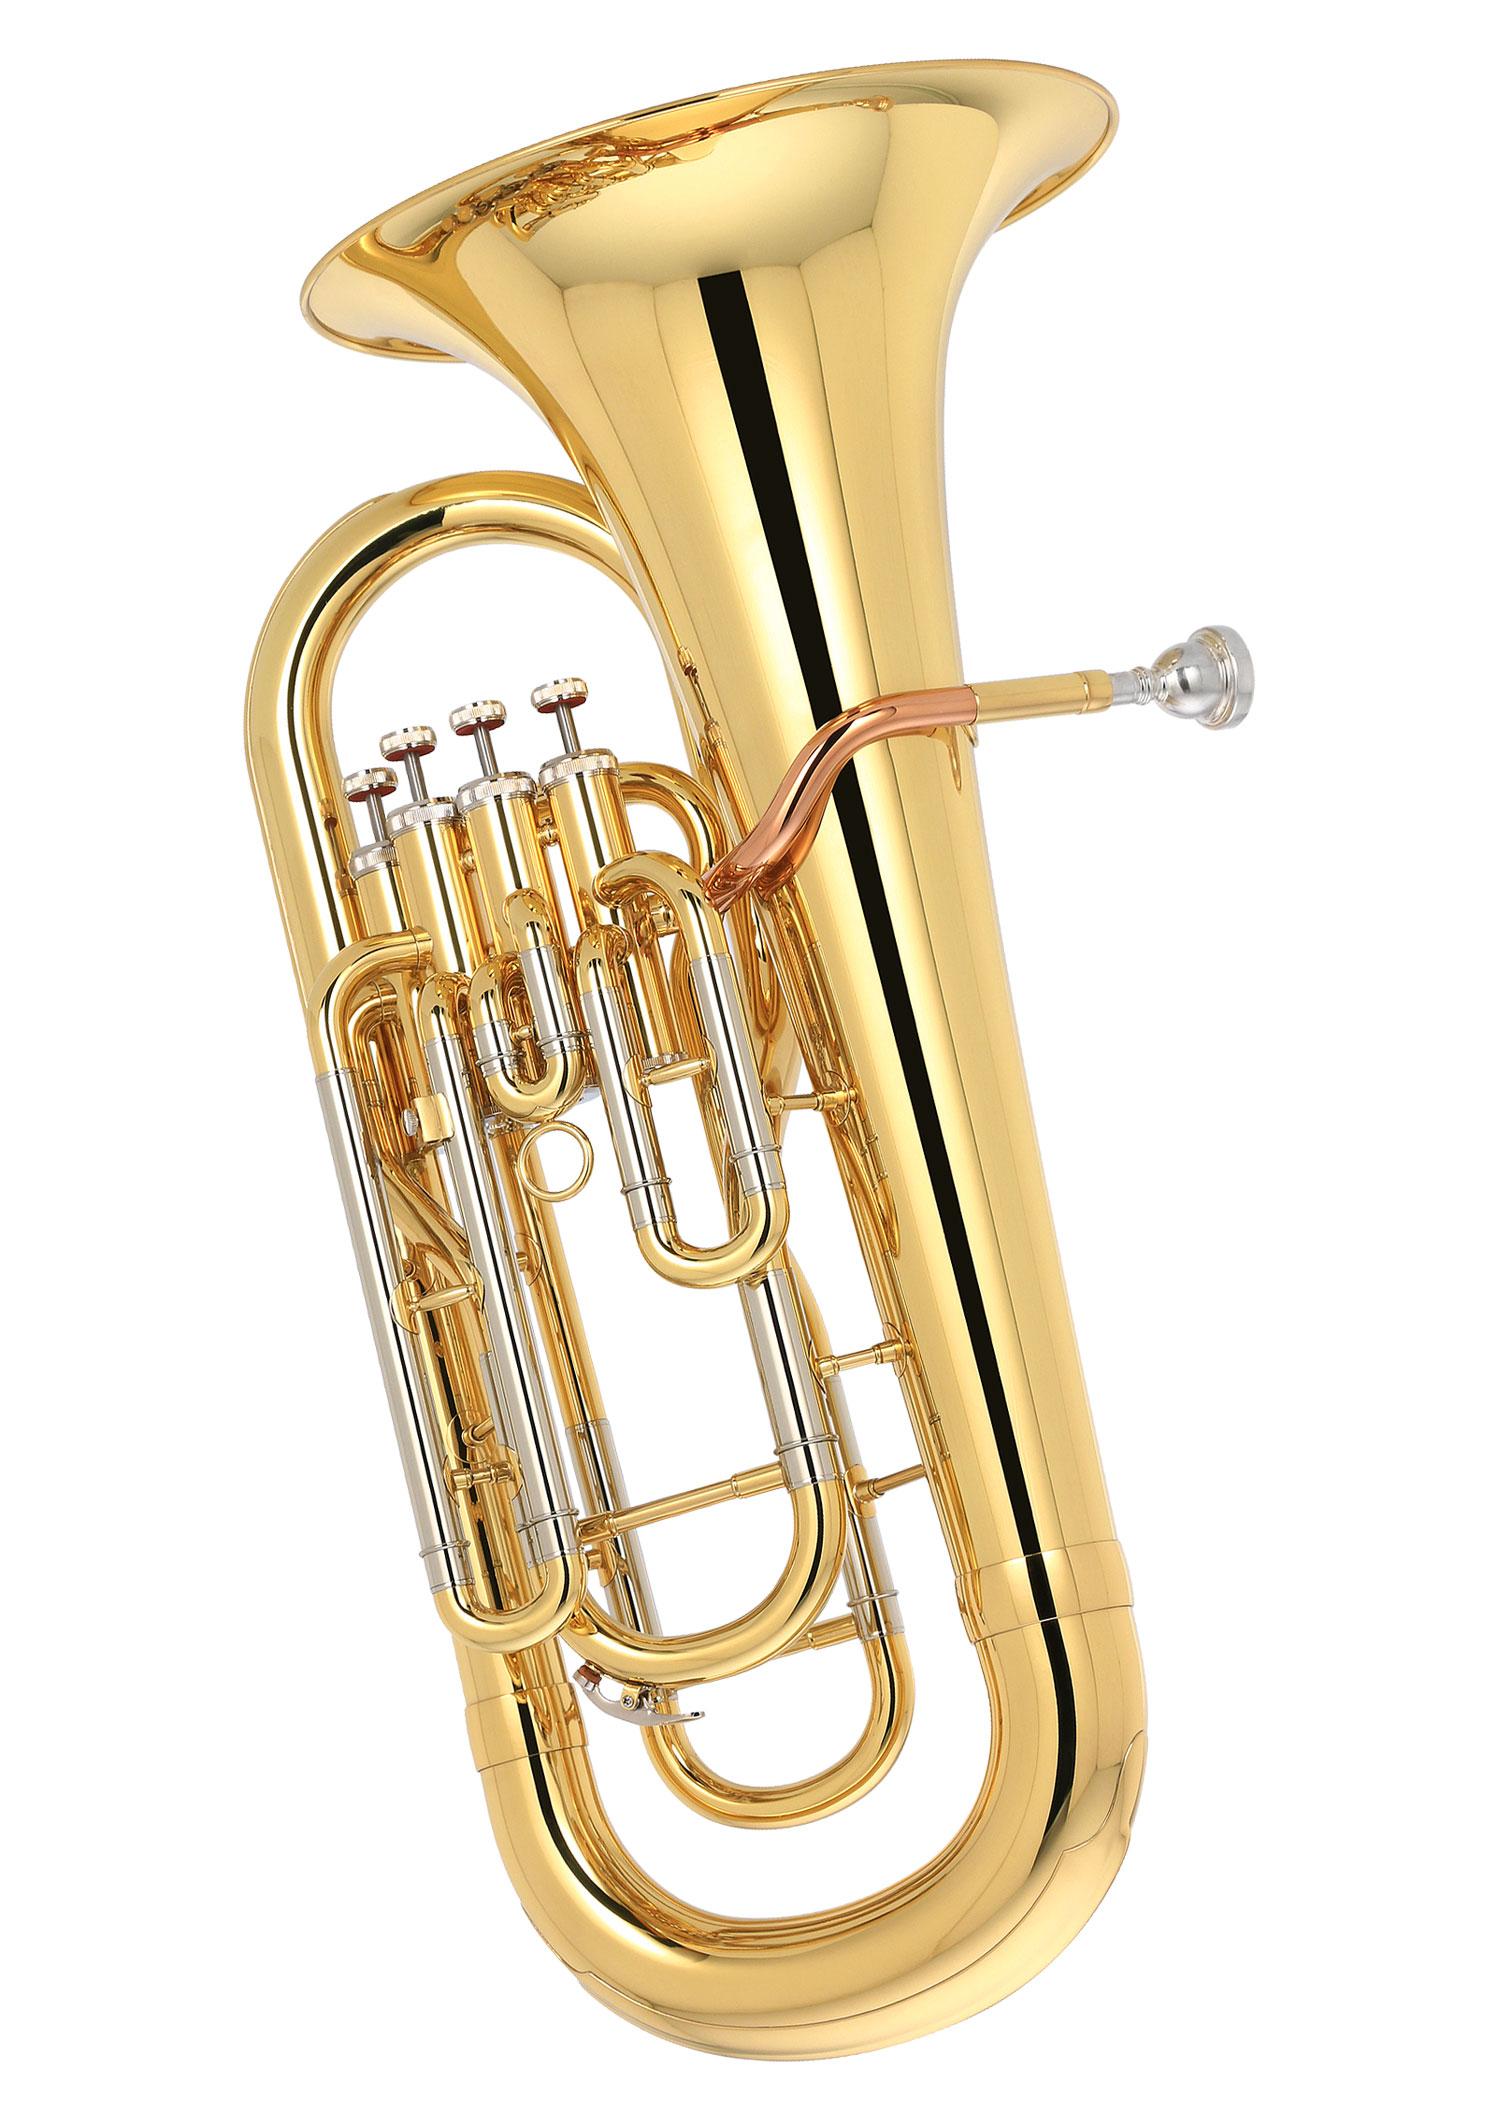 Zeu 3000 4 Valve Euphonium Euphonium Brass Series